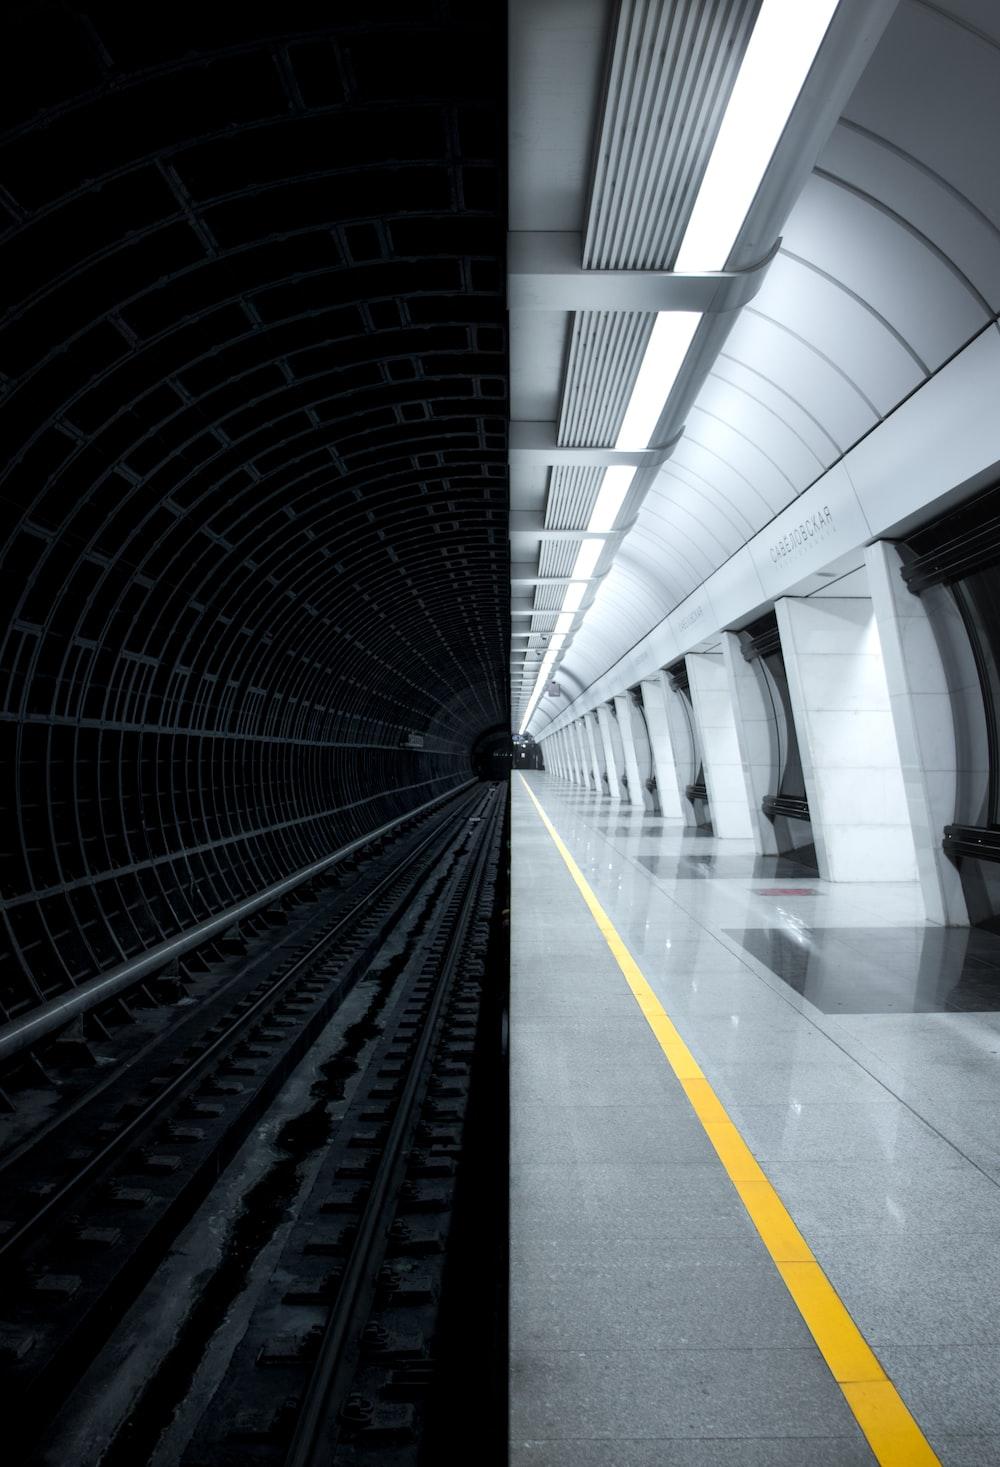 black train rail in tunnel